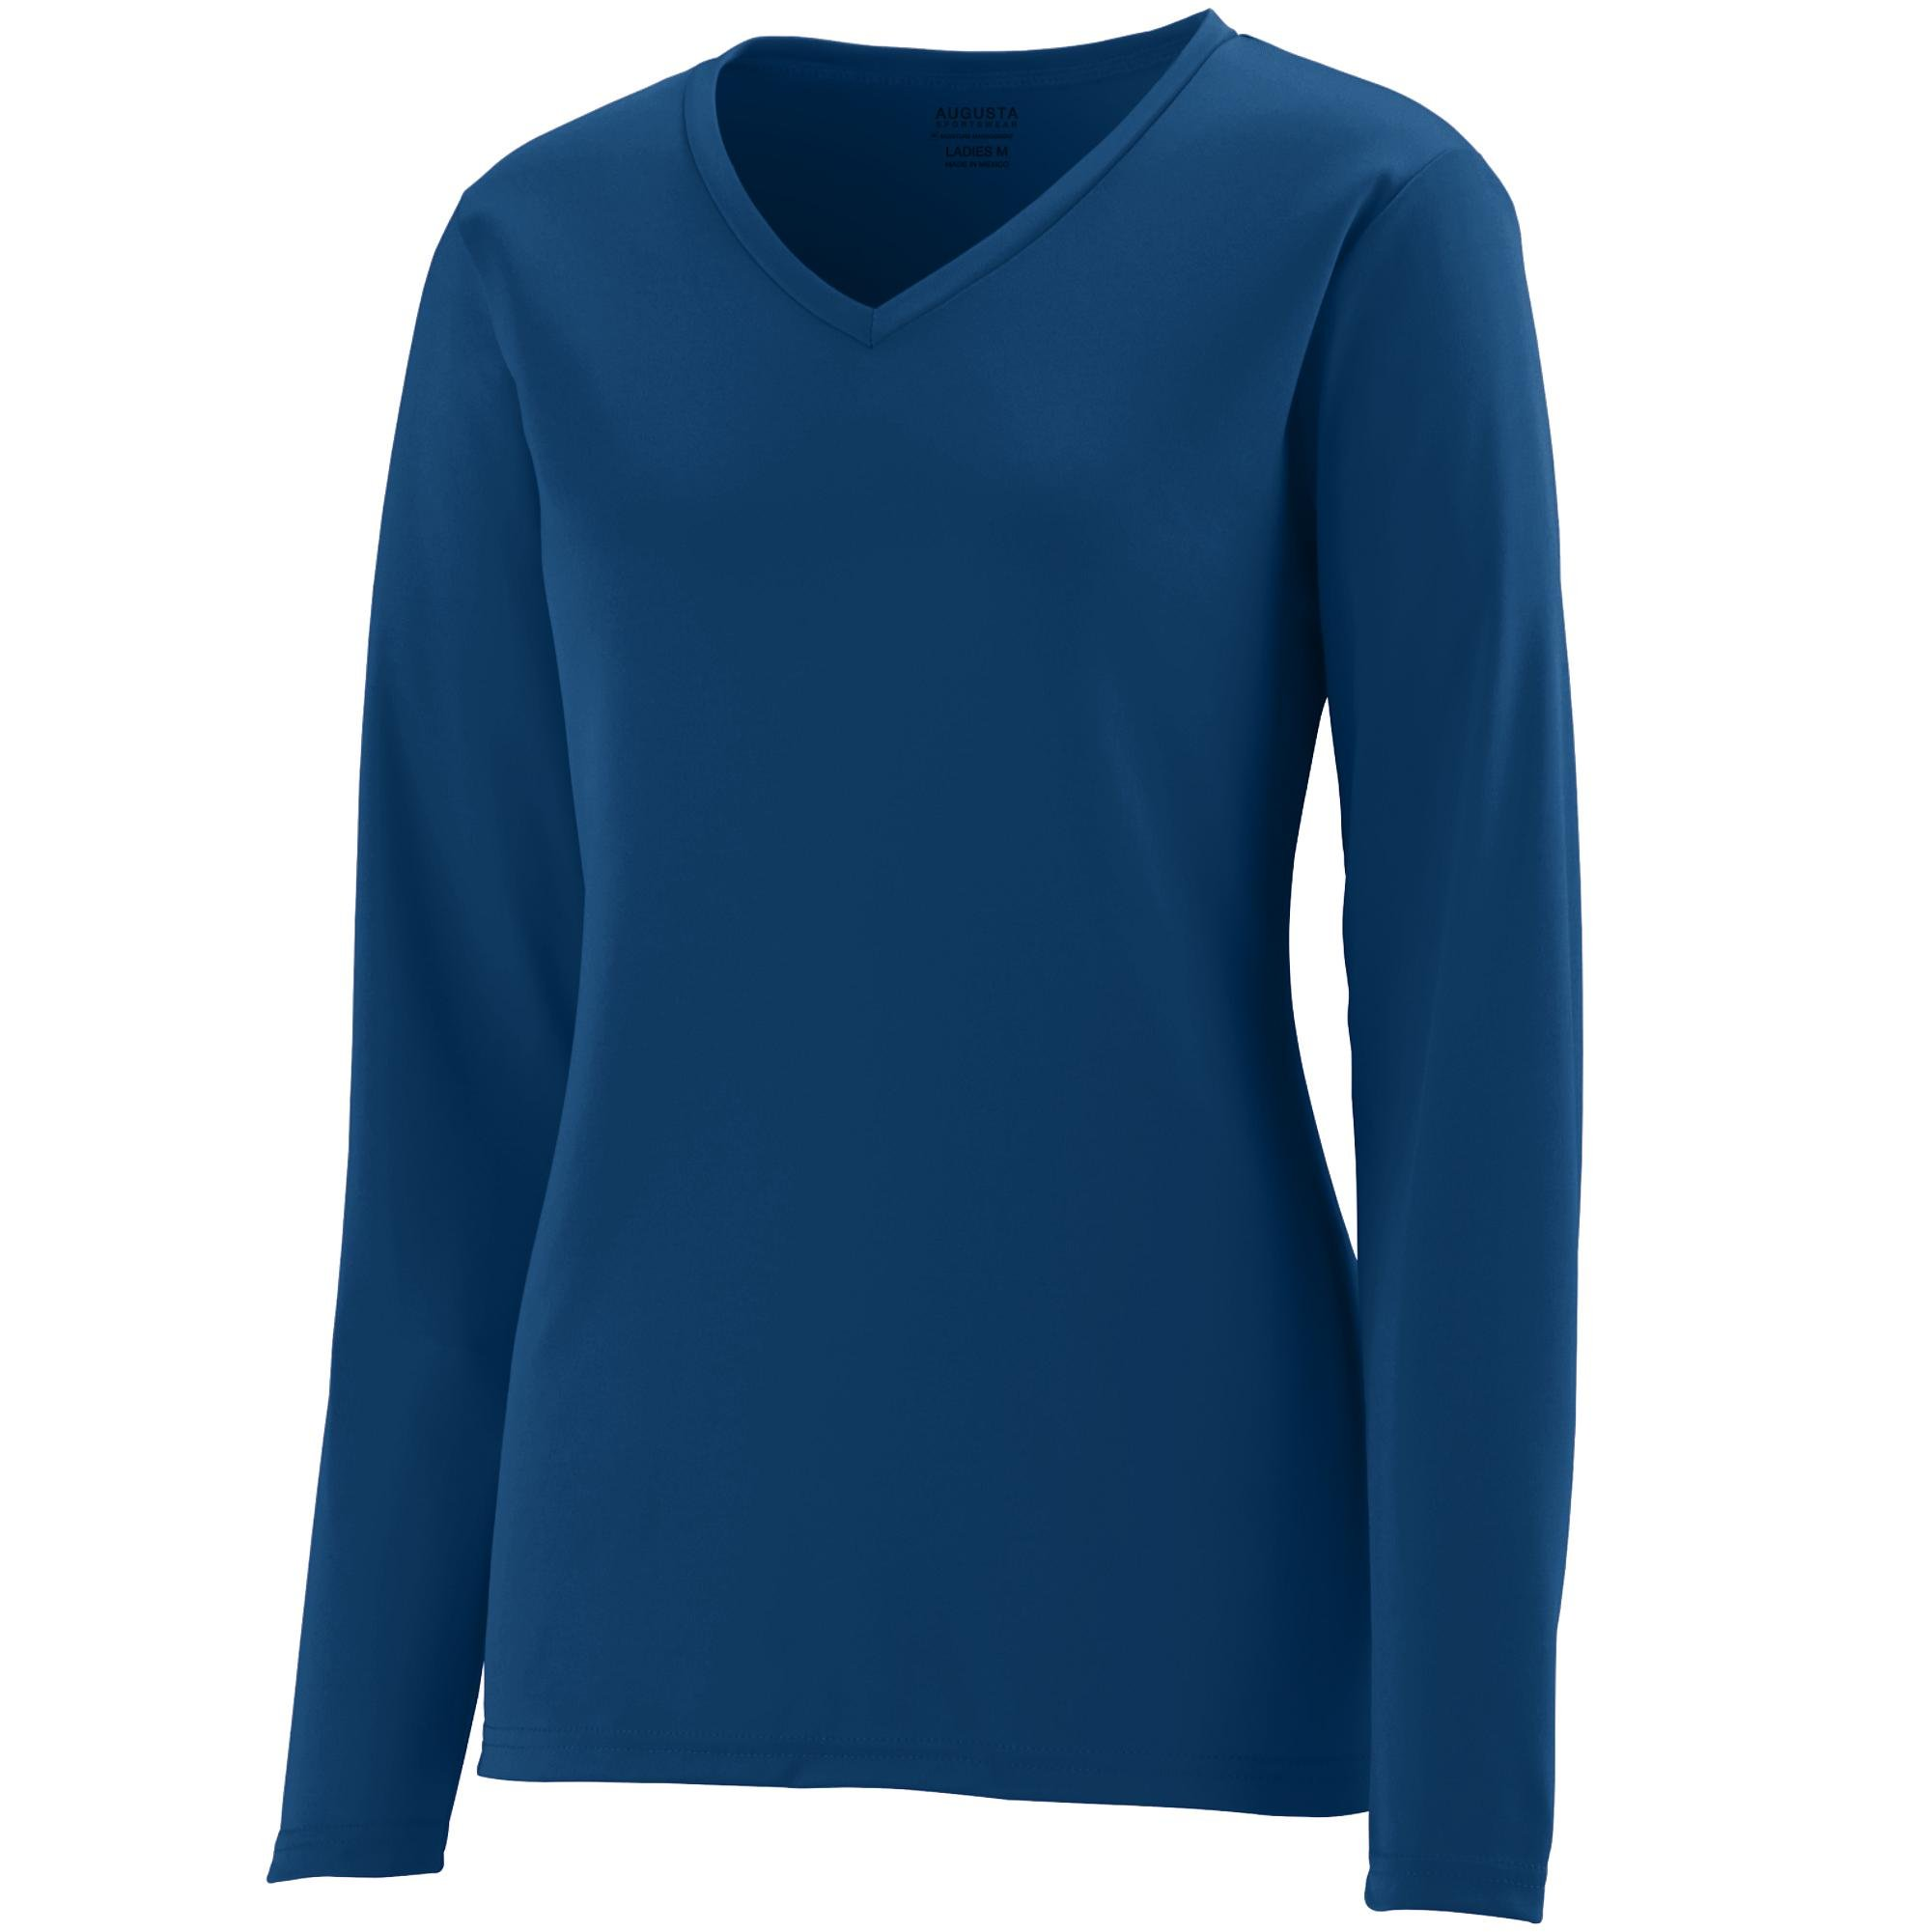 Augusta Sportswear Womens Long Sleeve Wicking T-Shirt, Navy, 3X-Large